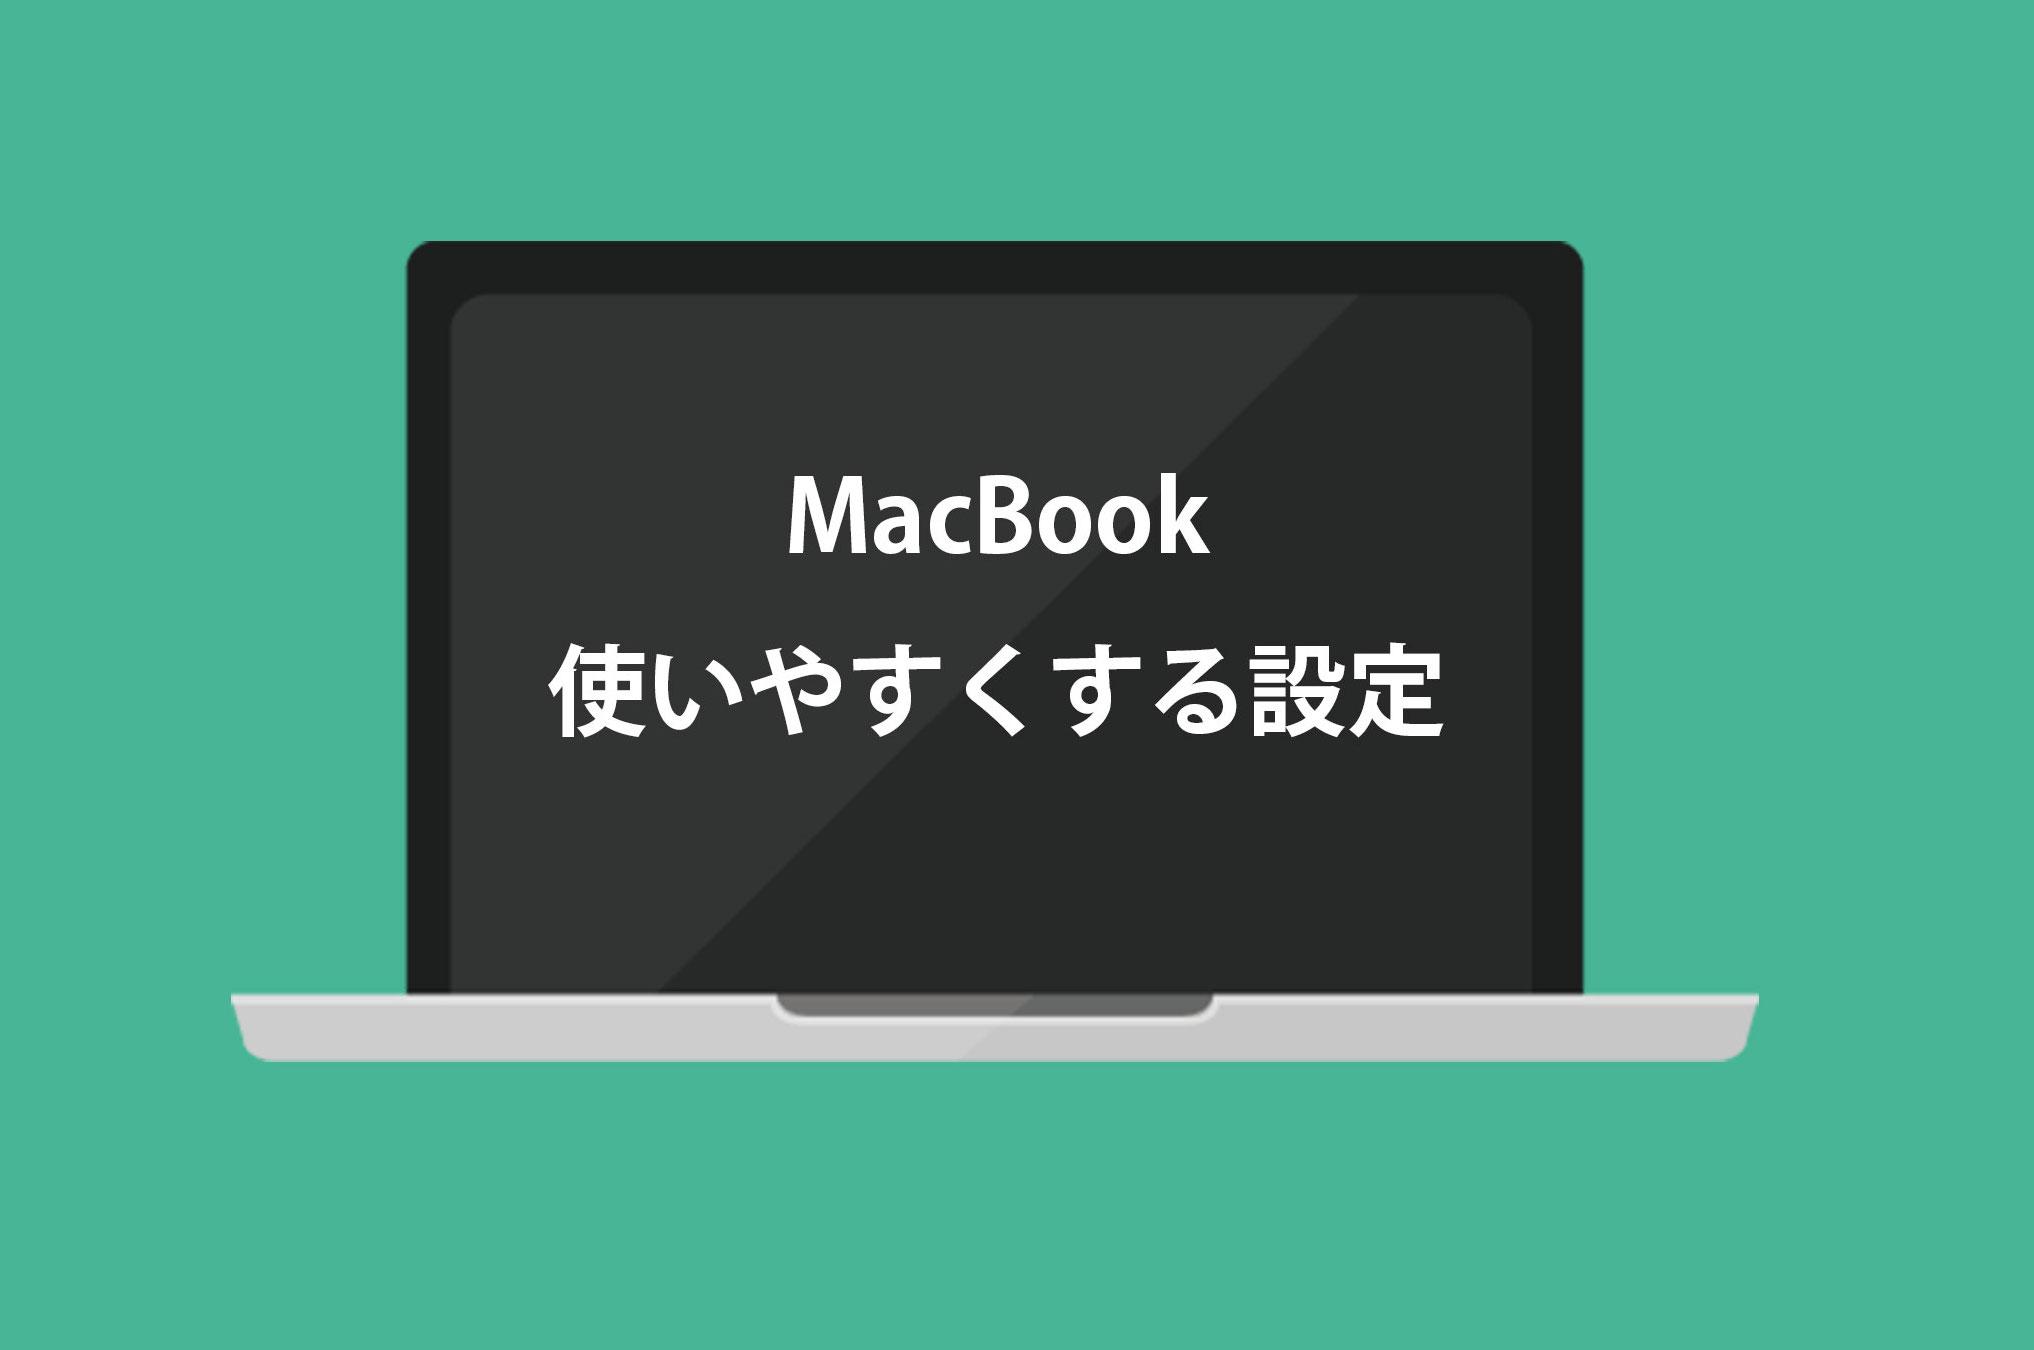 macbookのおすすめ設定